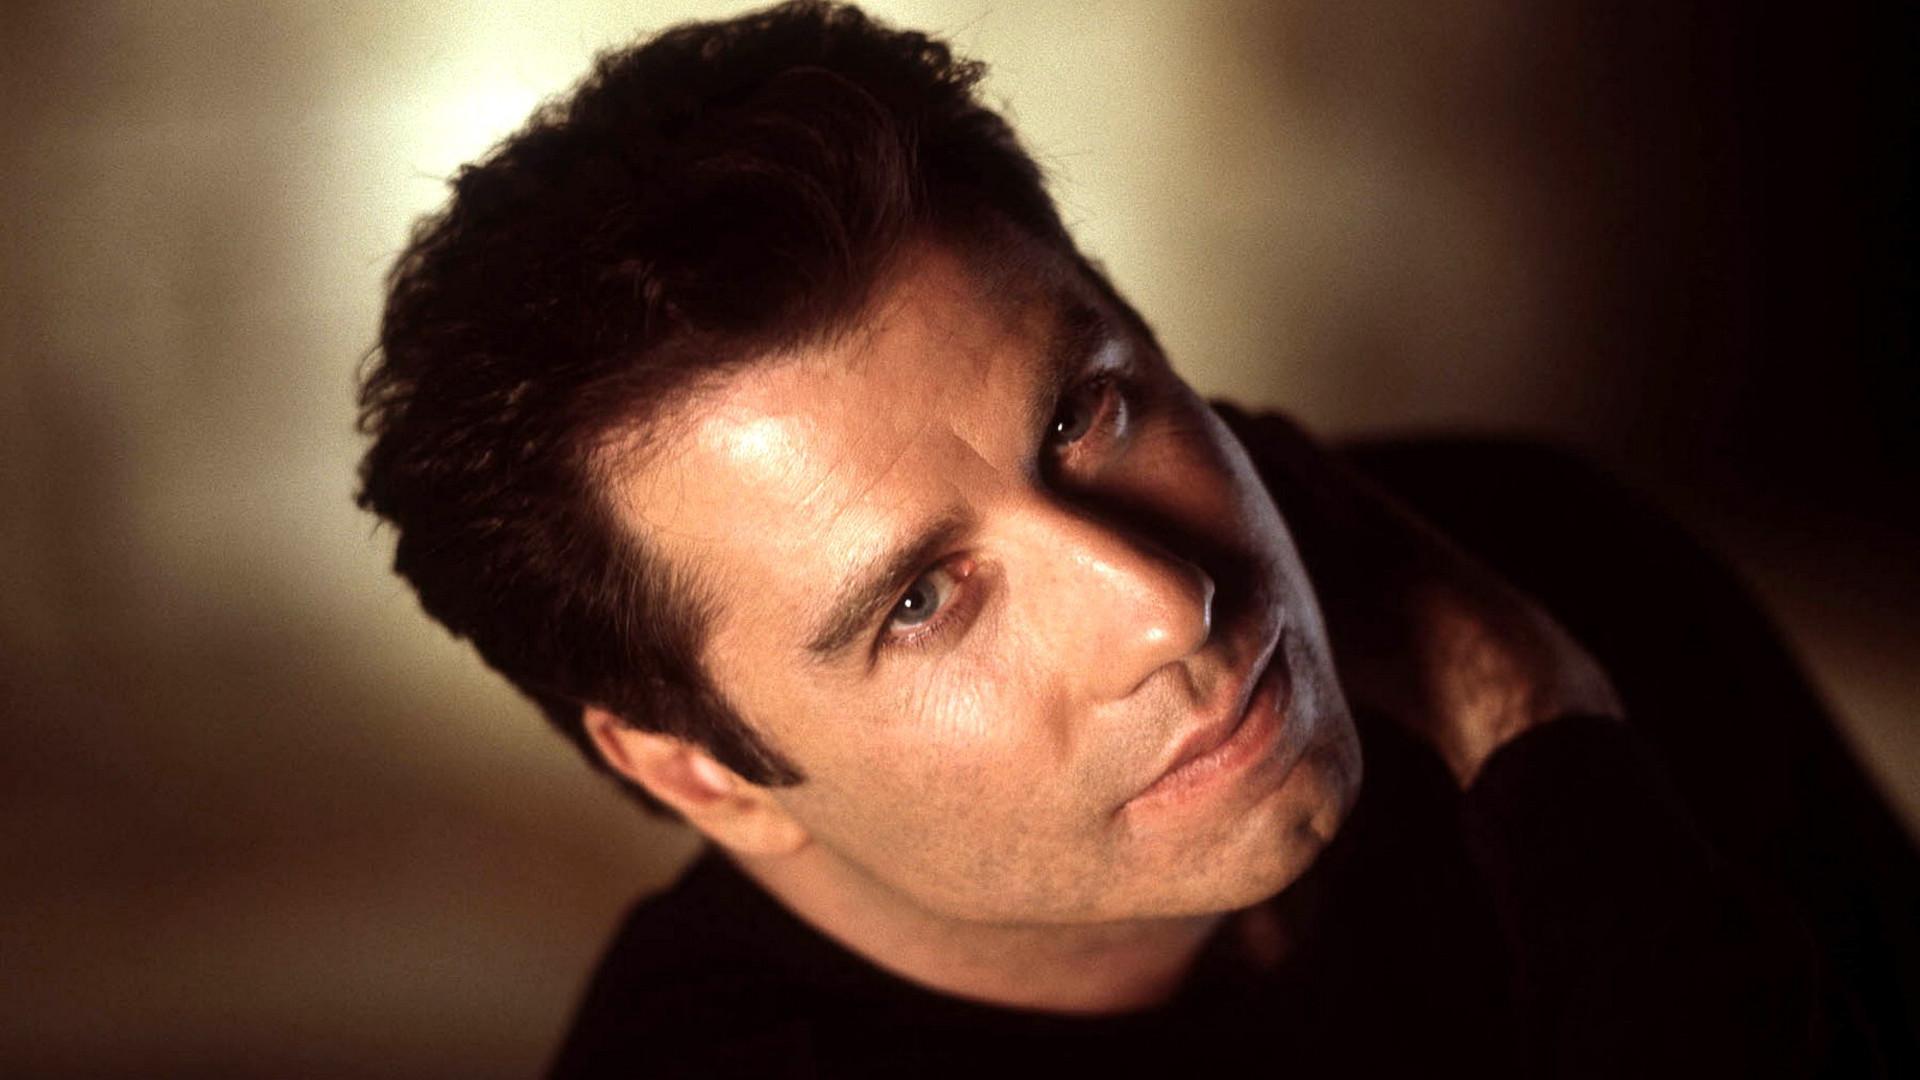 You're The One That I Want av John Travolta